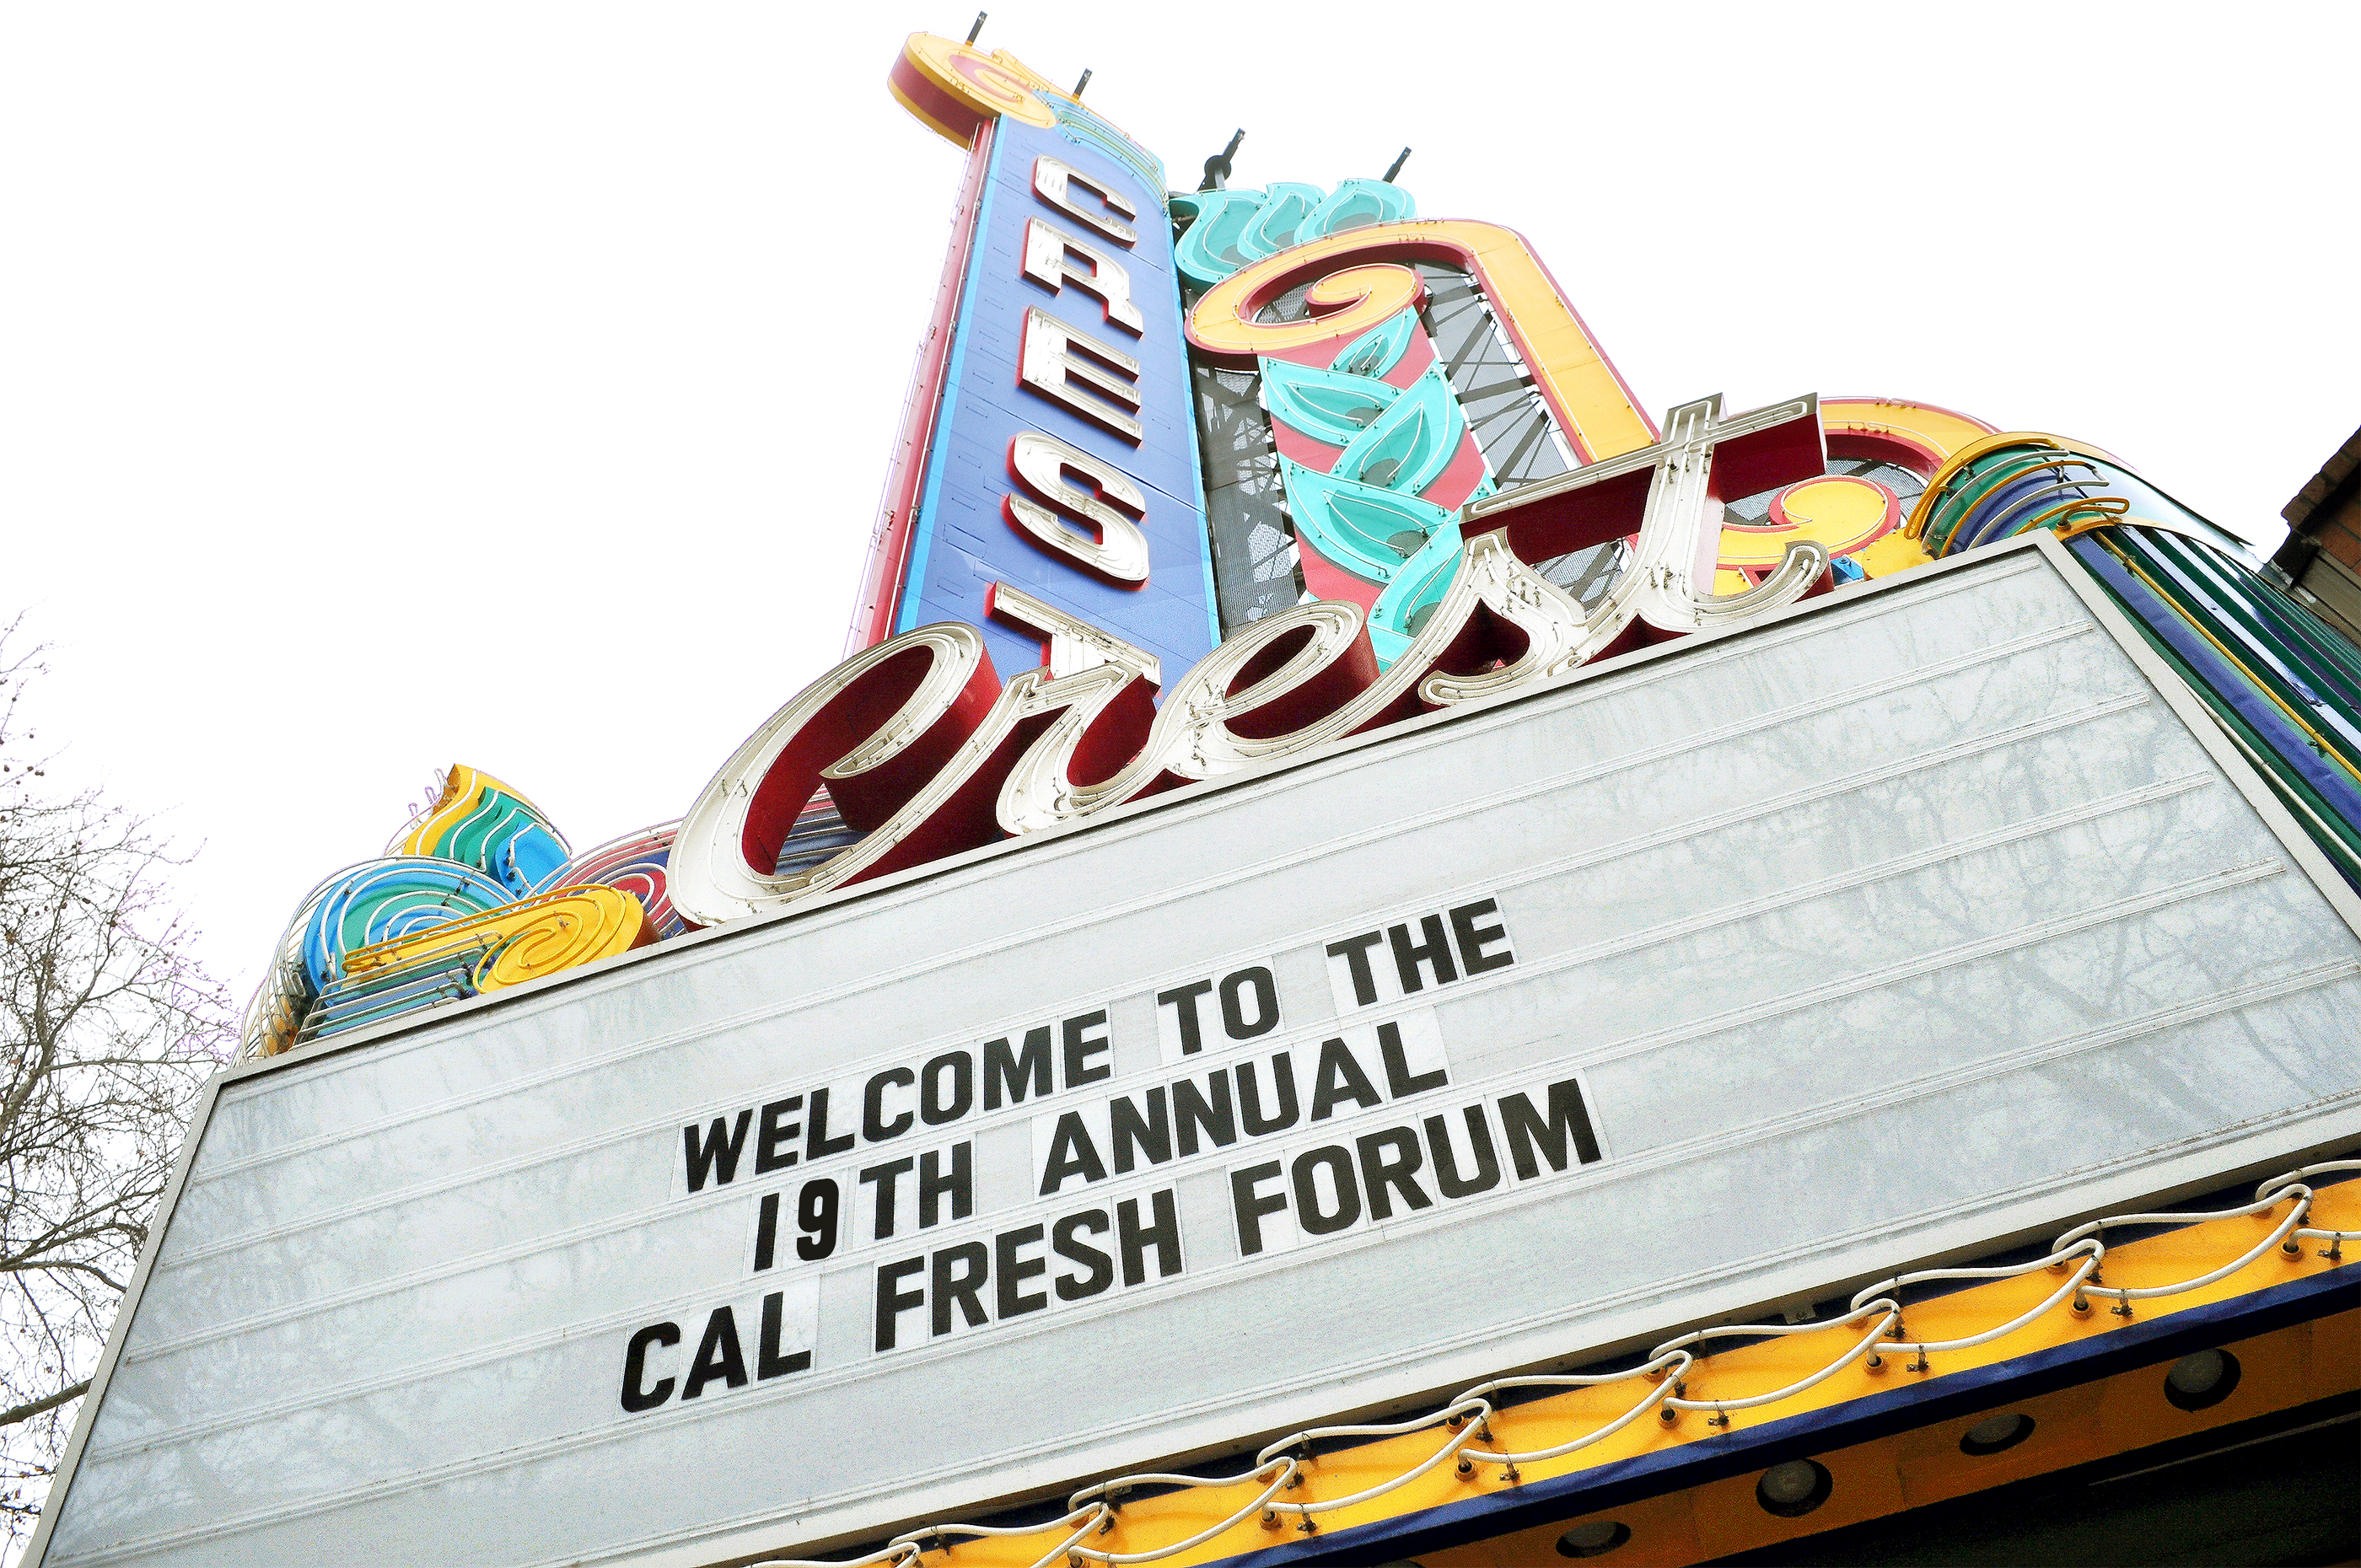 CalFreshForum-Crest-2019